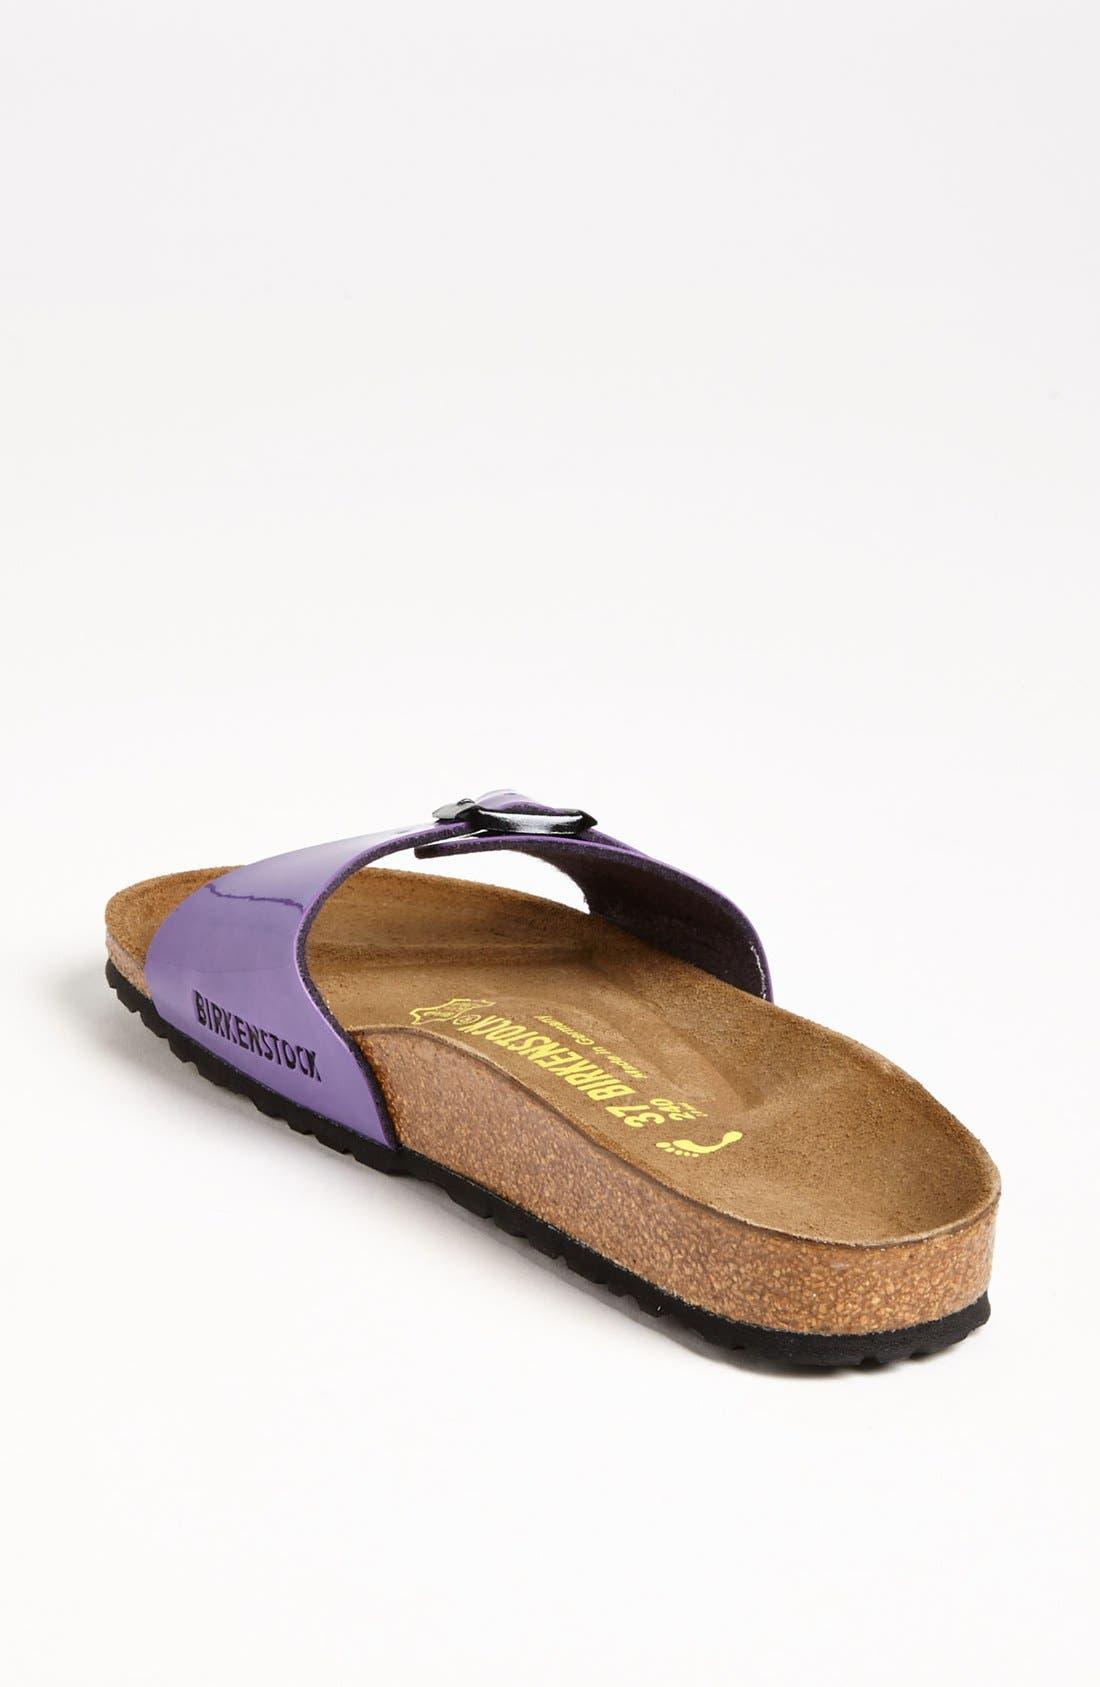 Alternate Image 2  - Birkenstock 'Madrid' Birko-Flor™ Sandal (Women)